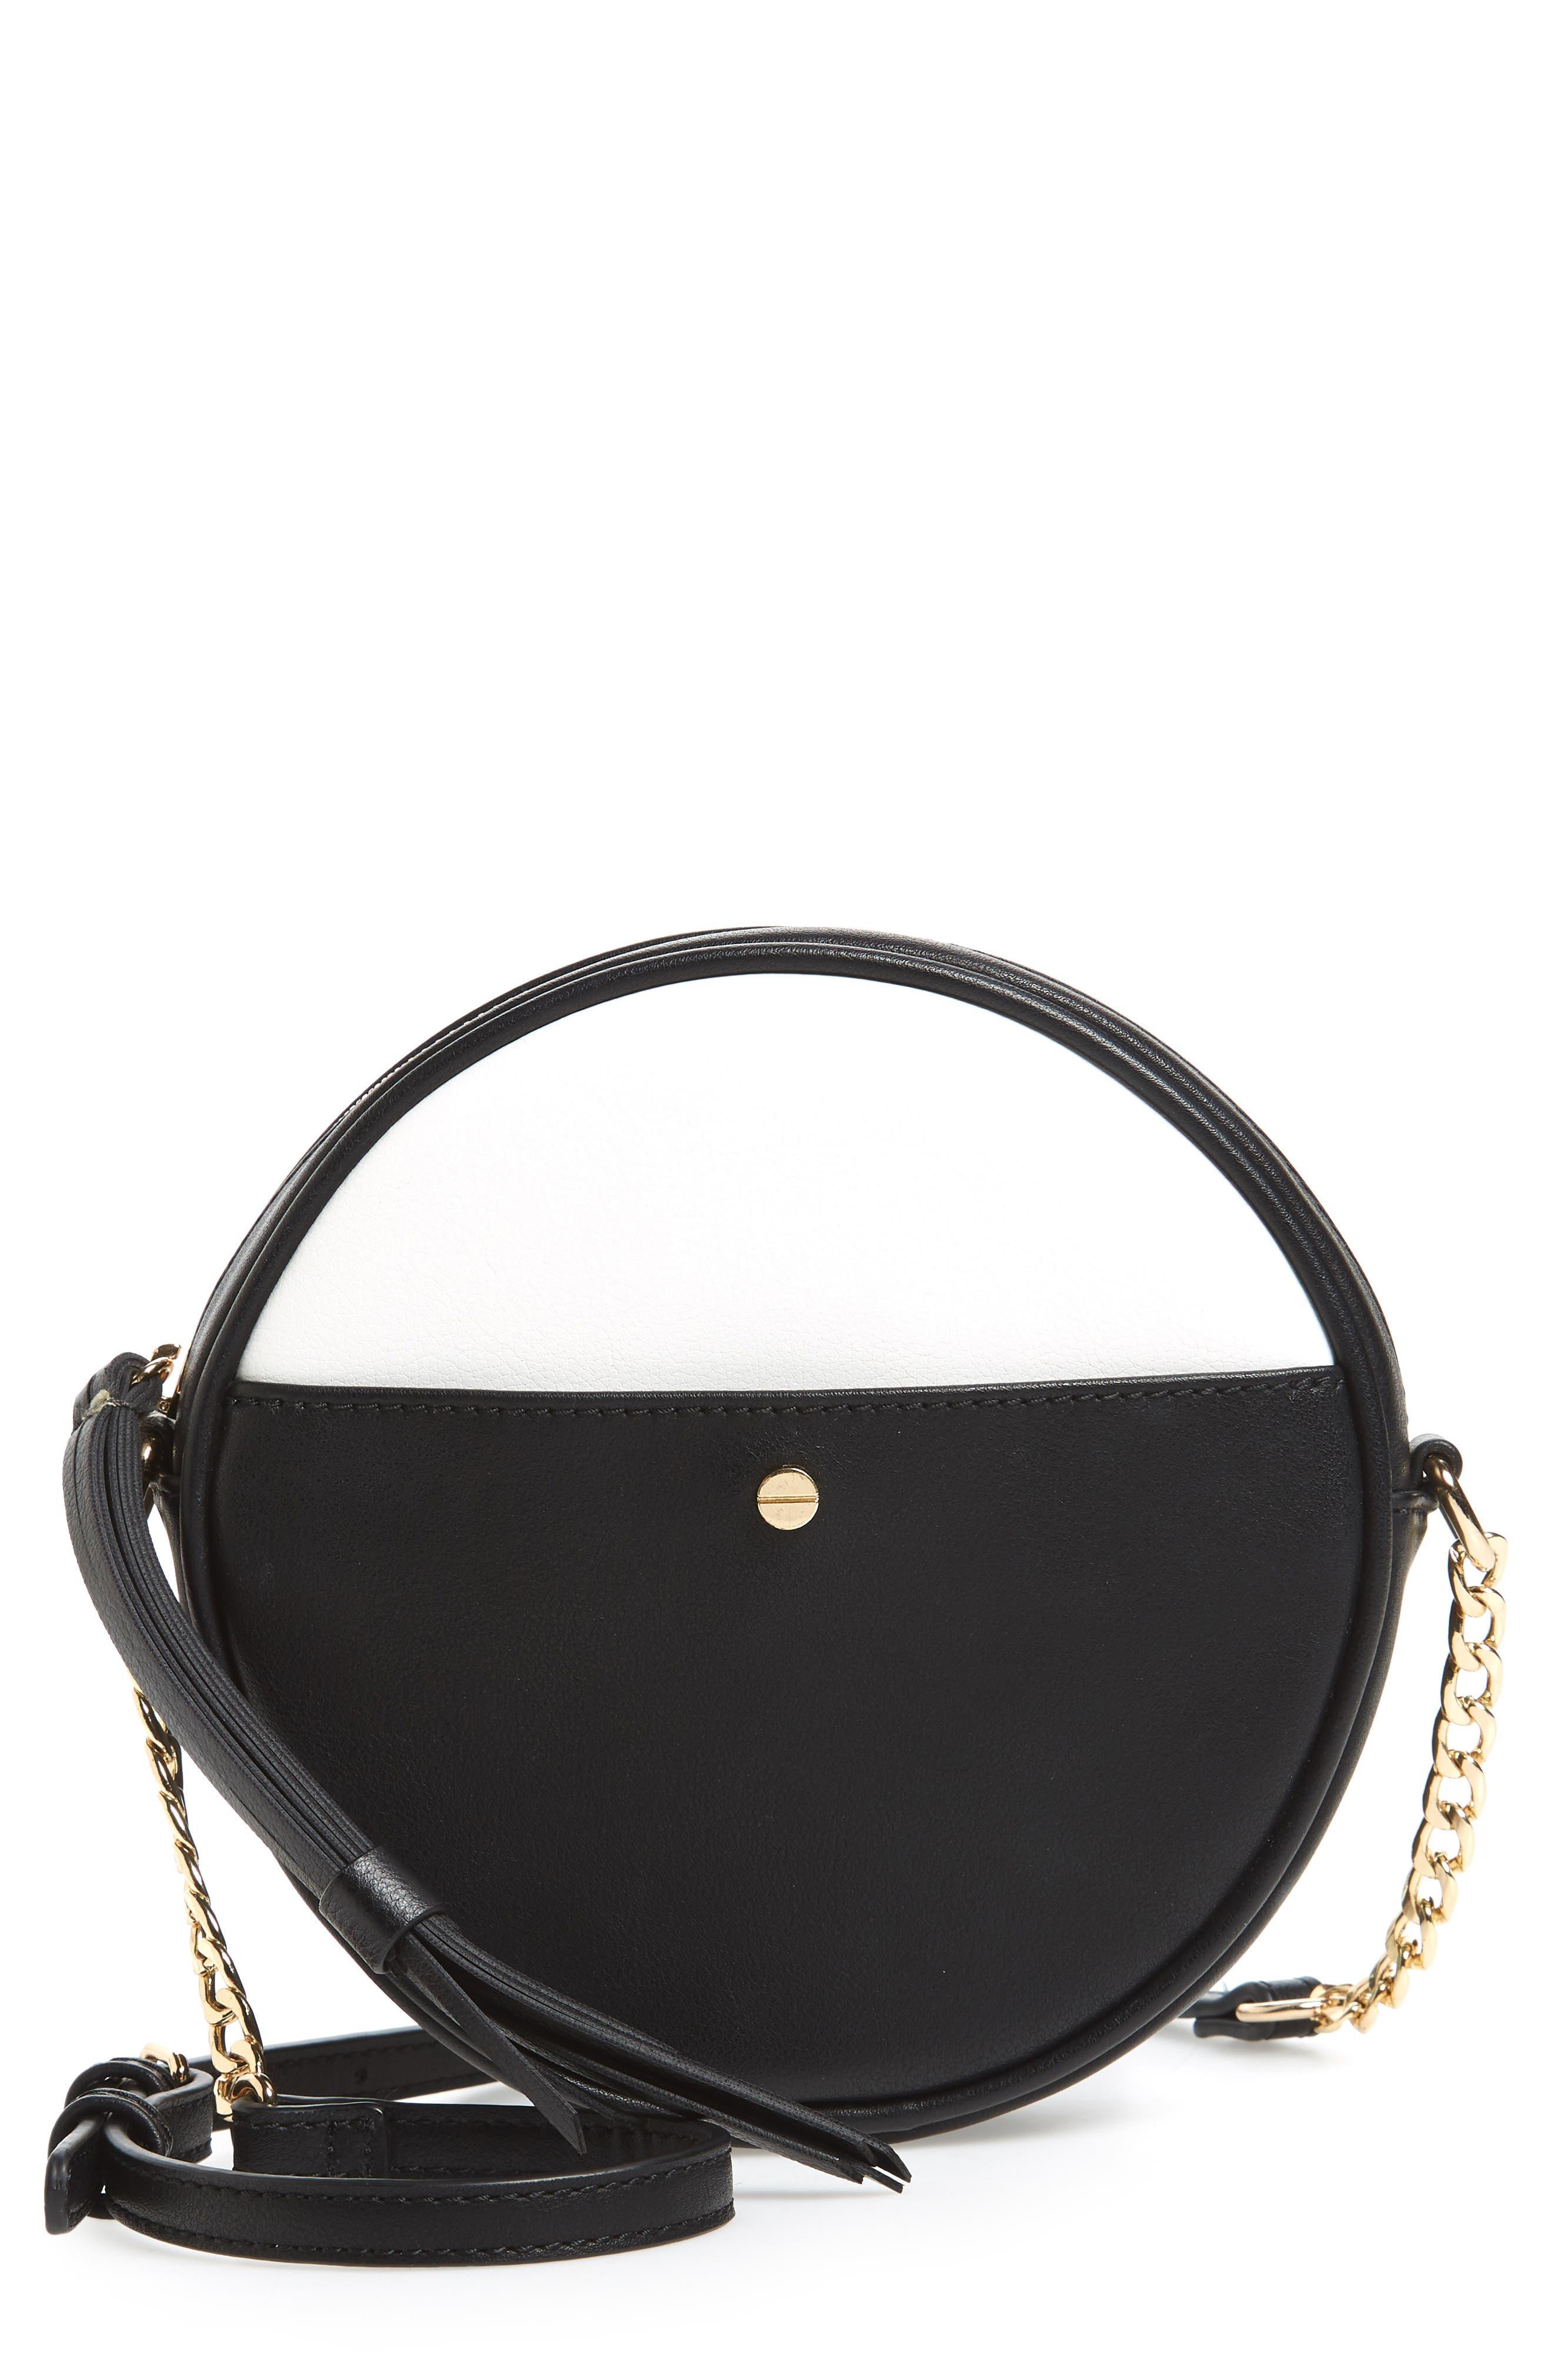 Mali + Lili Payton Vegan Leather Canteen Crossbody Bag,                             Main thumbnail 1, color,                             Black/ White